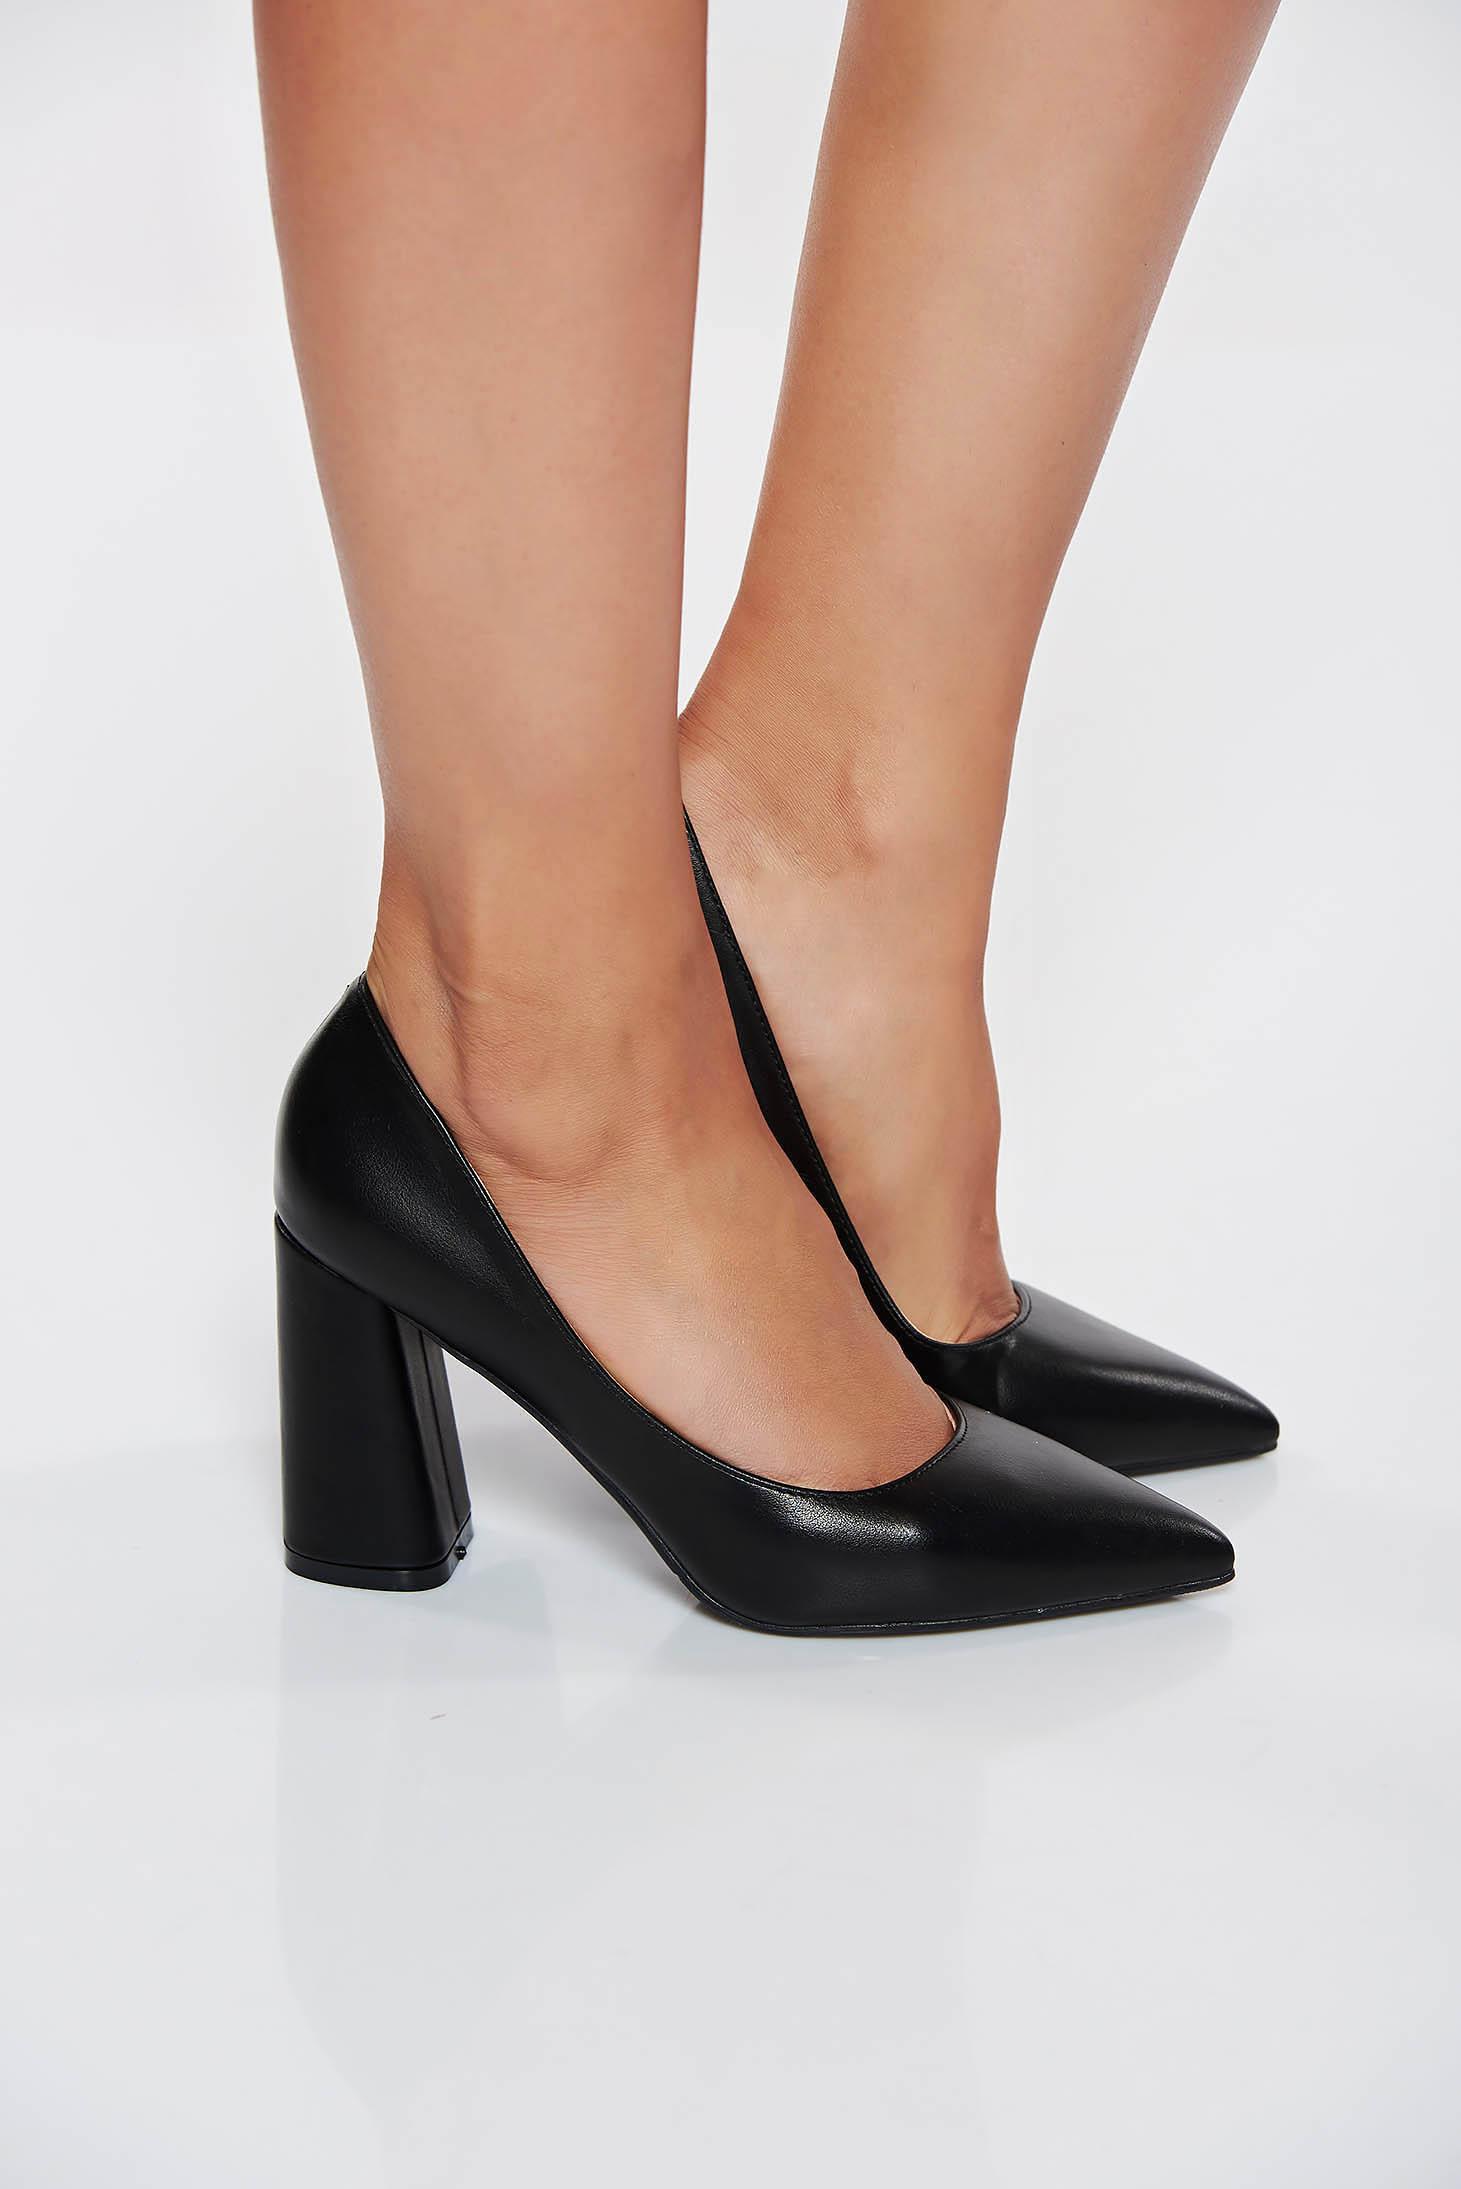 Pantofi negri eleganti cu toc gros din piele ecologica